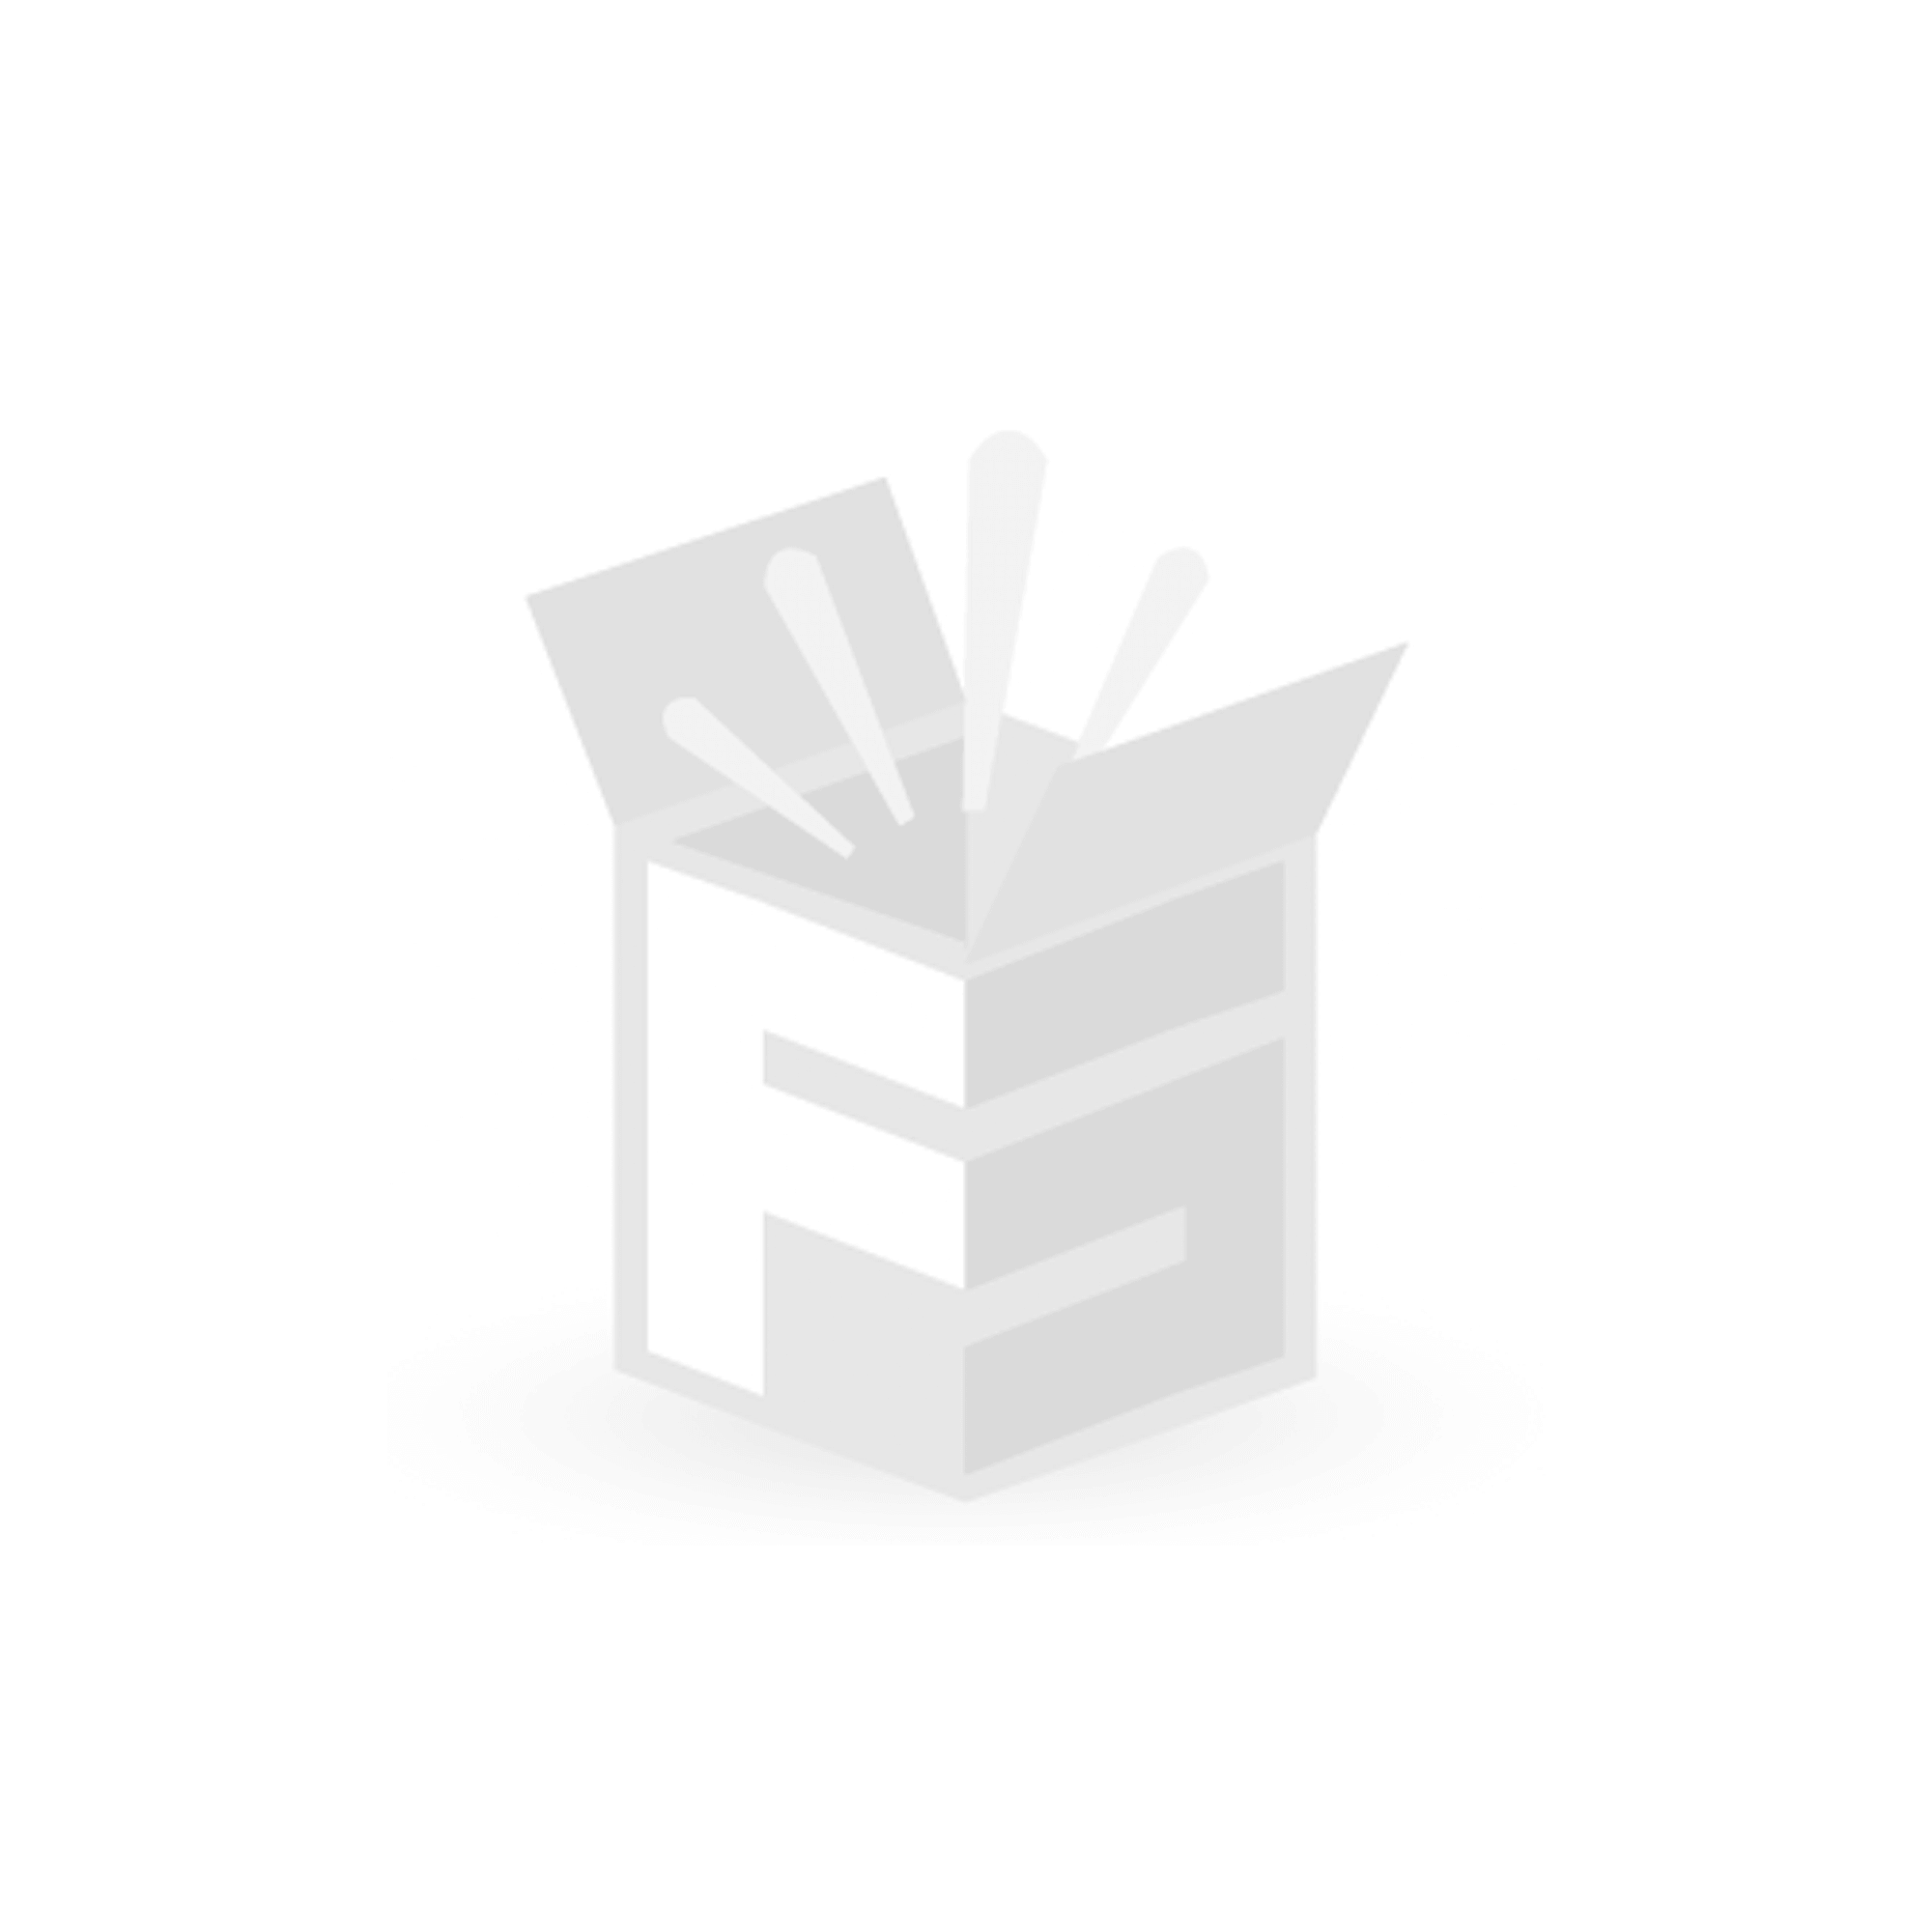 FS-STAR Ouvre-boîte 25 cm